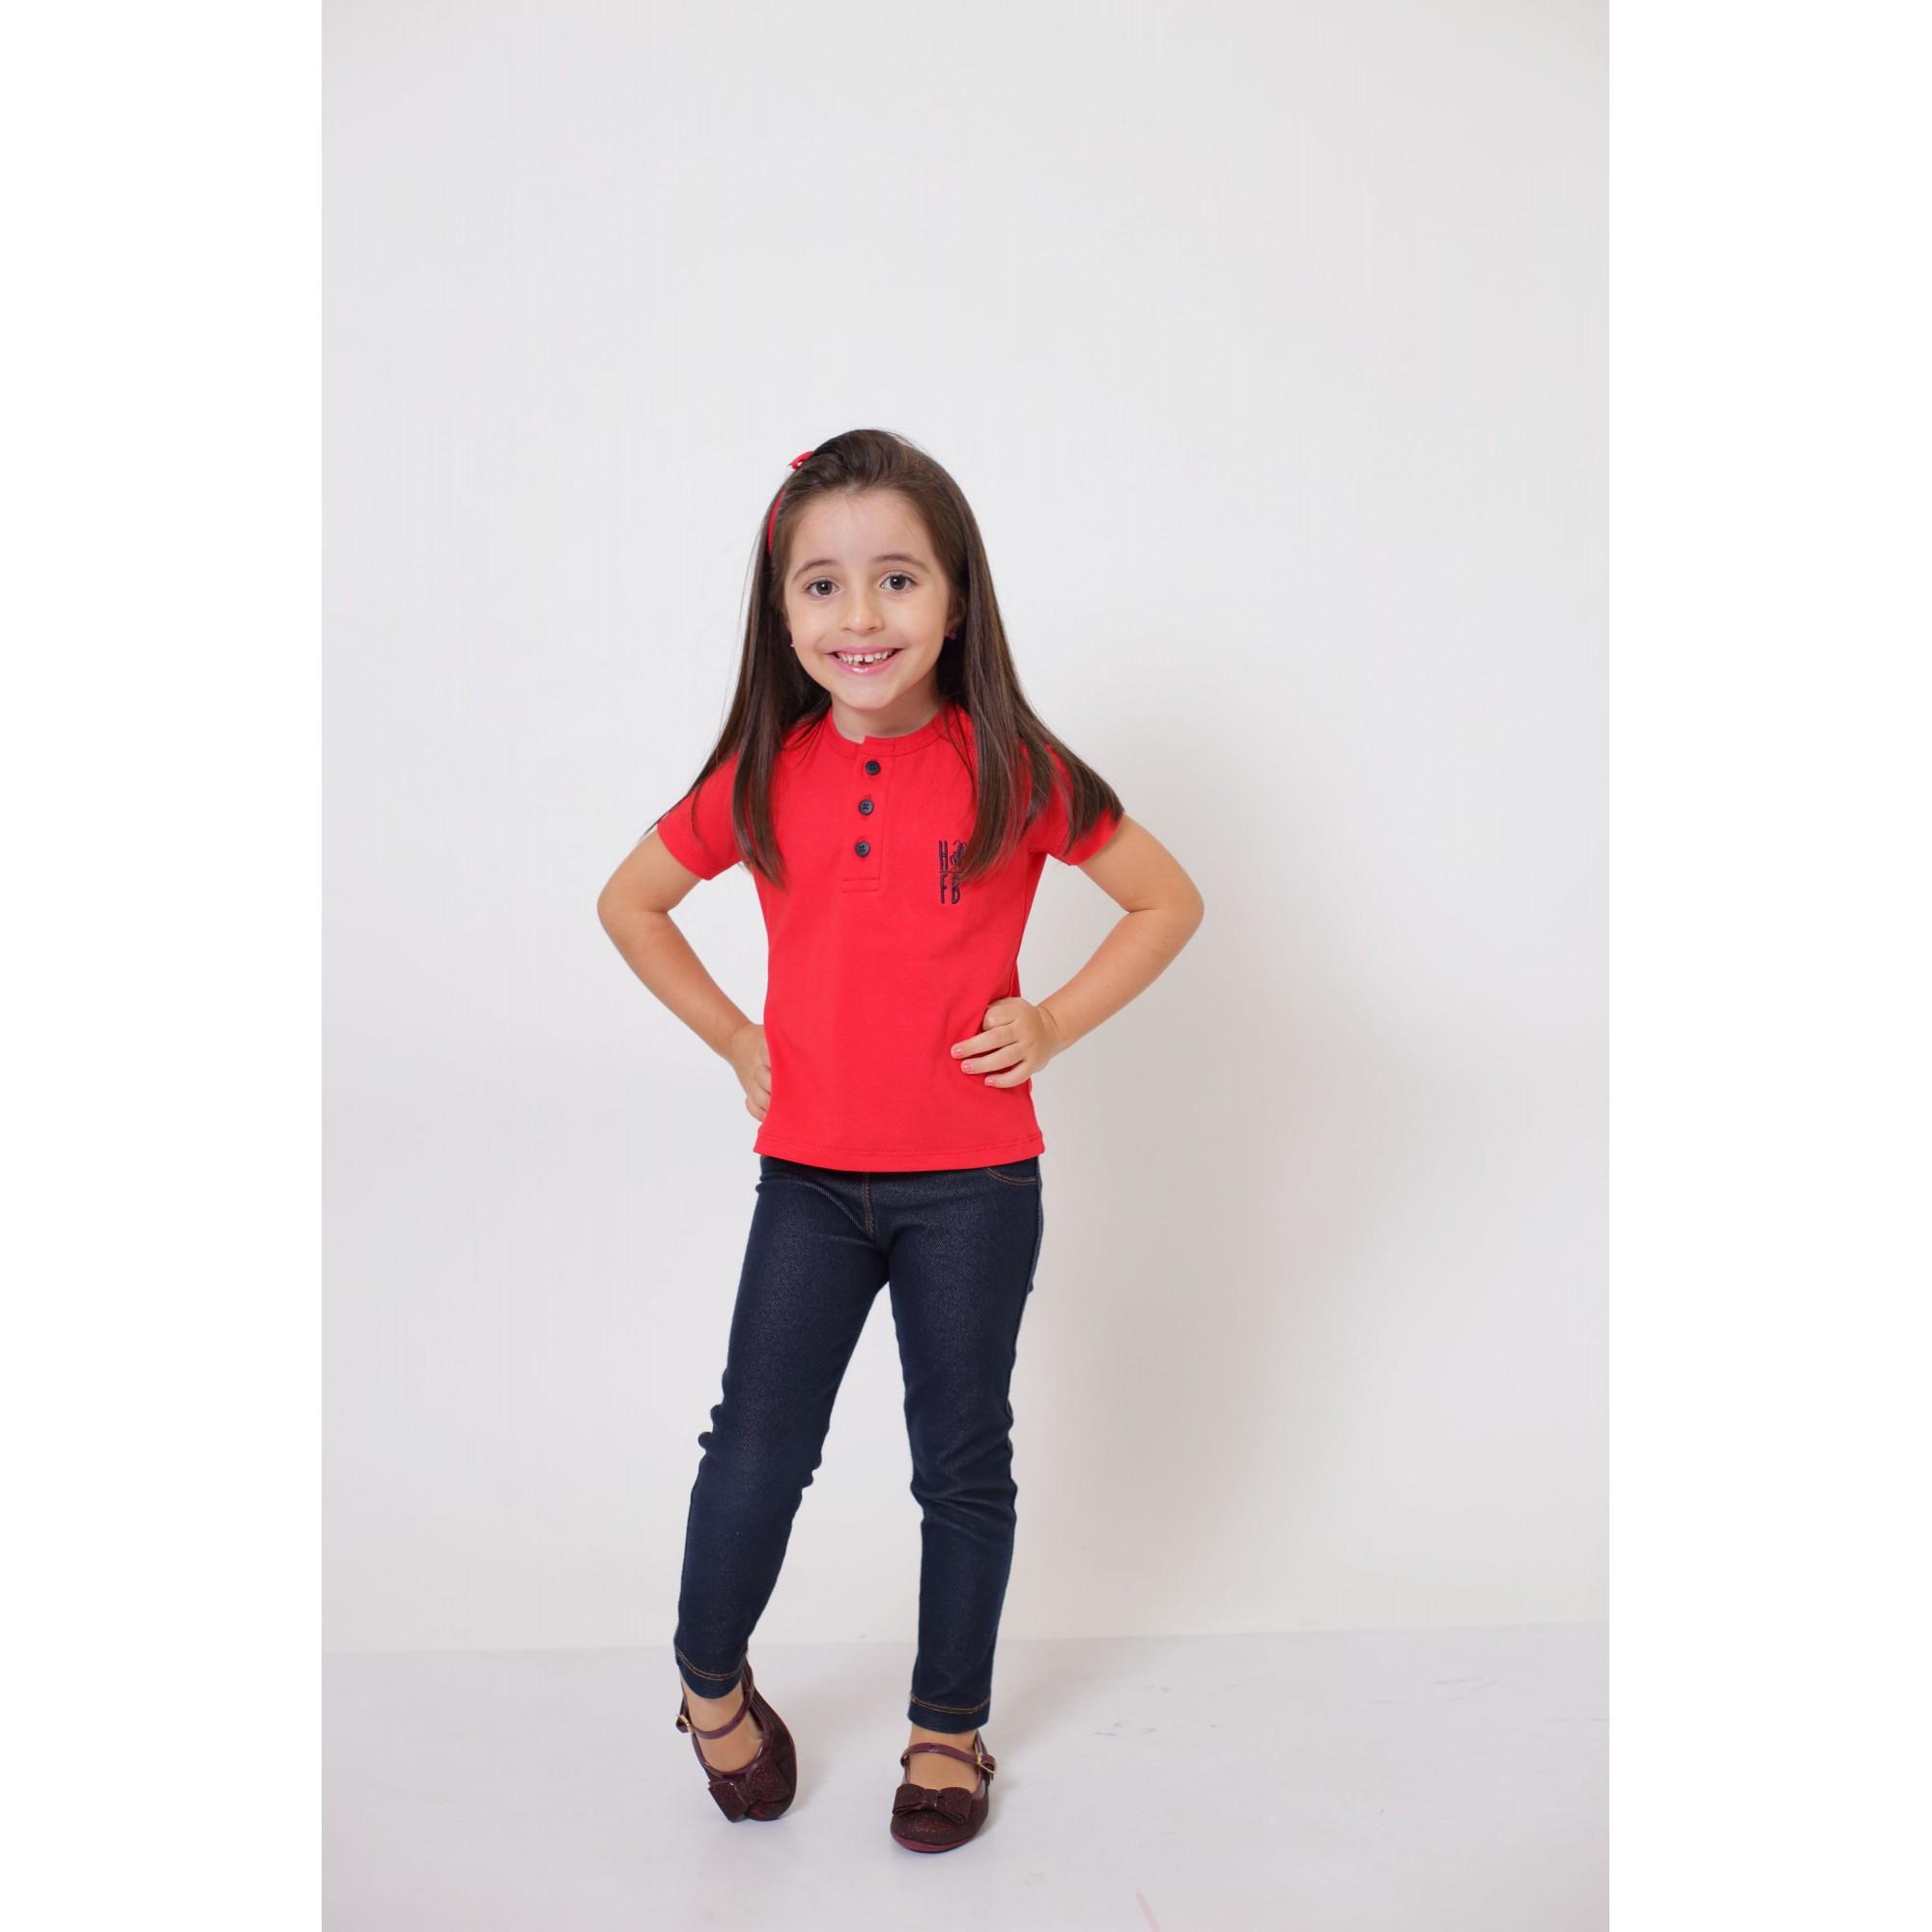 PAI E FILHA > T-Shirt Adulto  + T-Shirt ou Body Infantil - Henley - Vermelho  [Coleção Tal Pai Tal Filha]  - Heitor Fashion Brazil